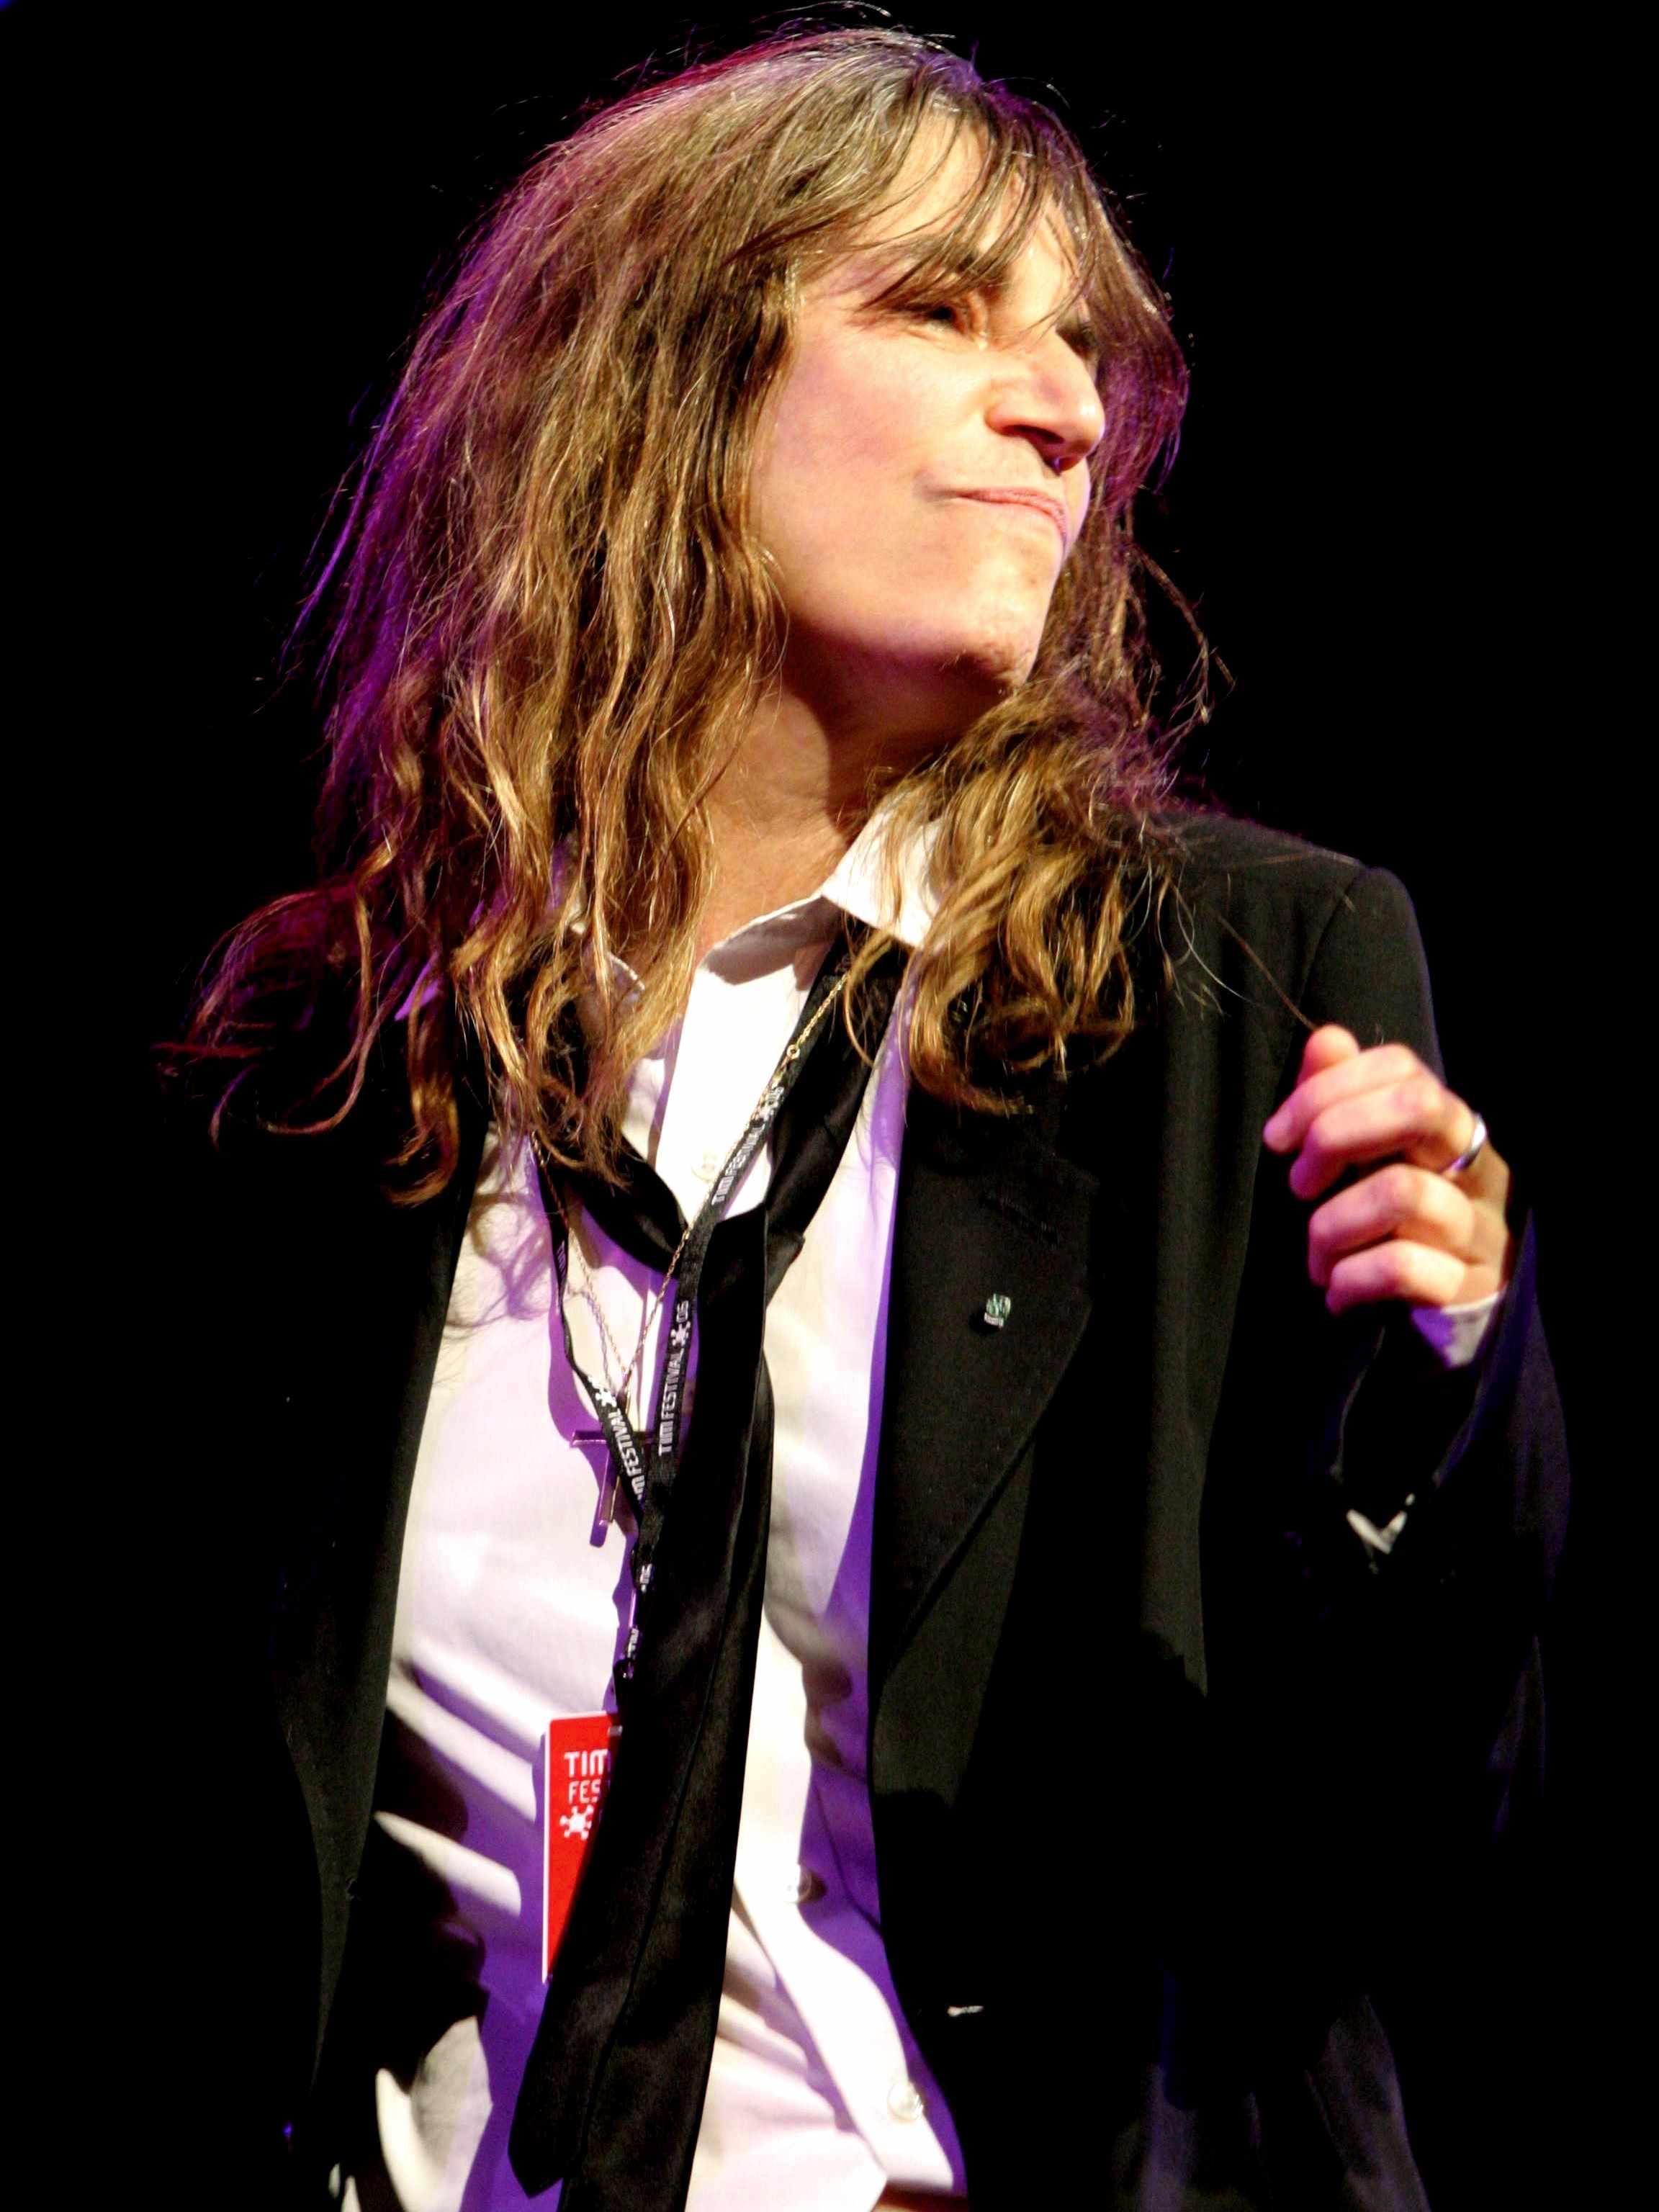 Diva među divovima, drugi deo - Patti Smith